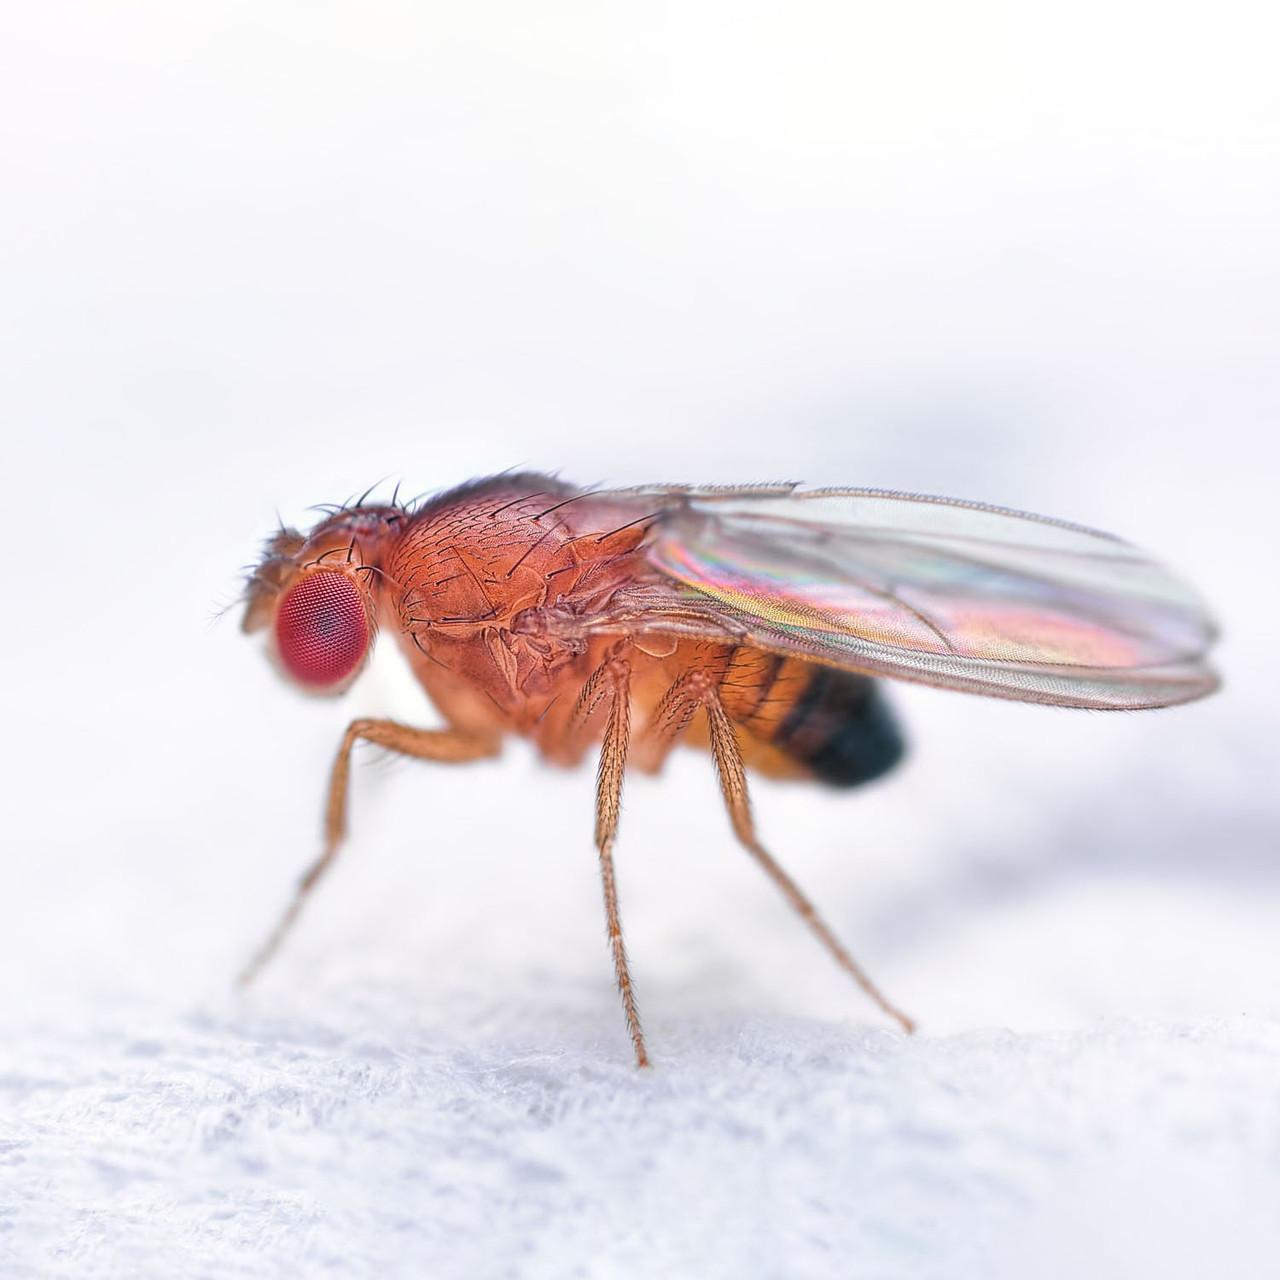 L7.3 - Drosophila, wild type, live